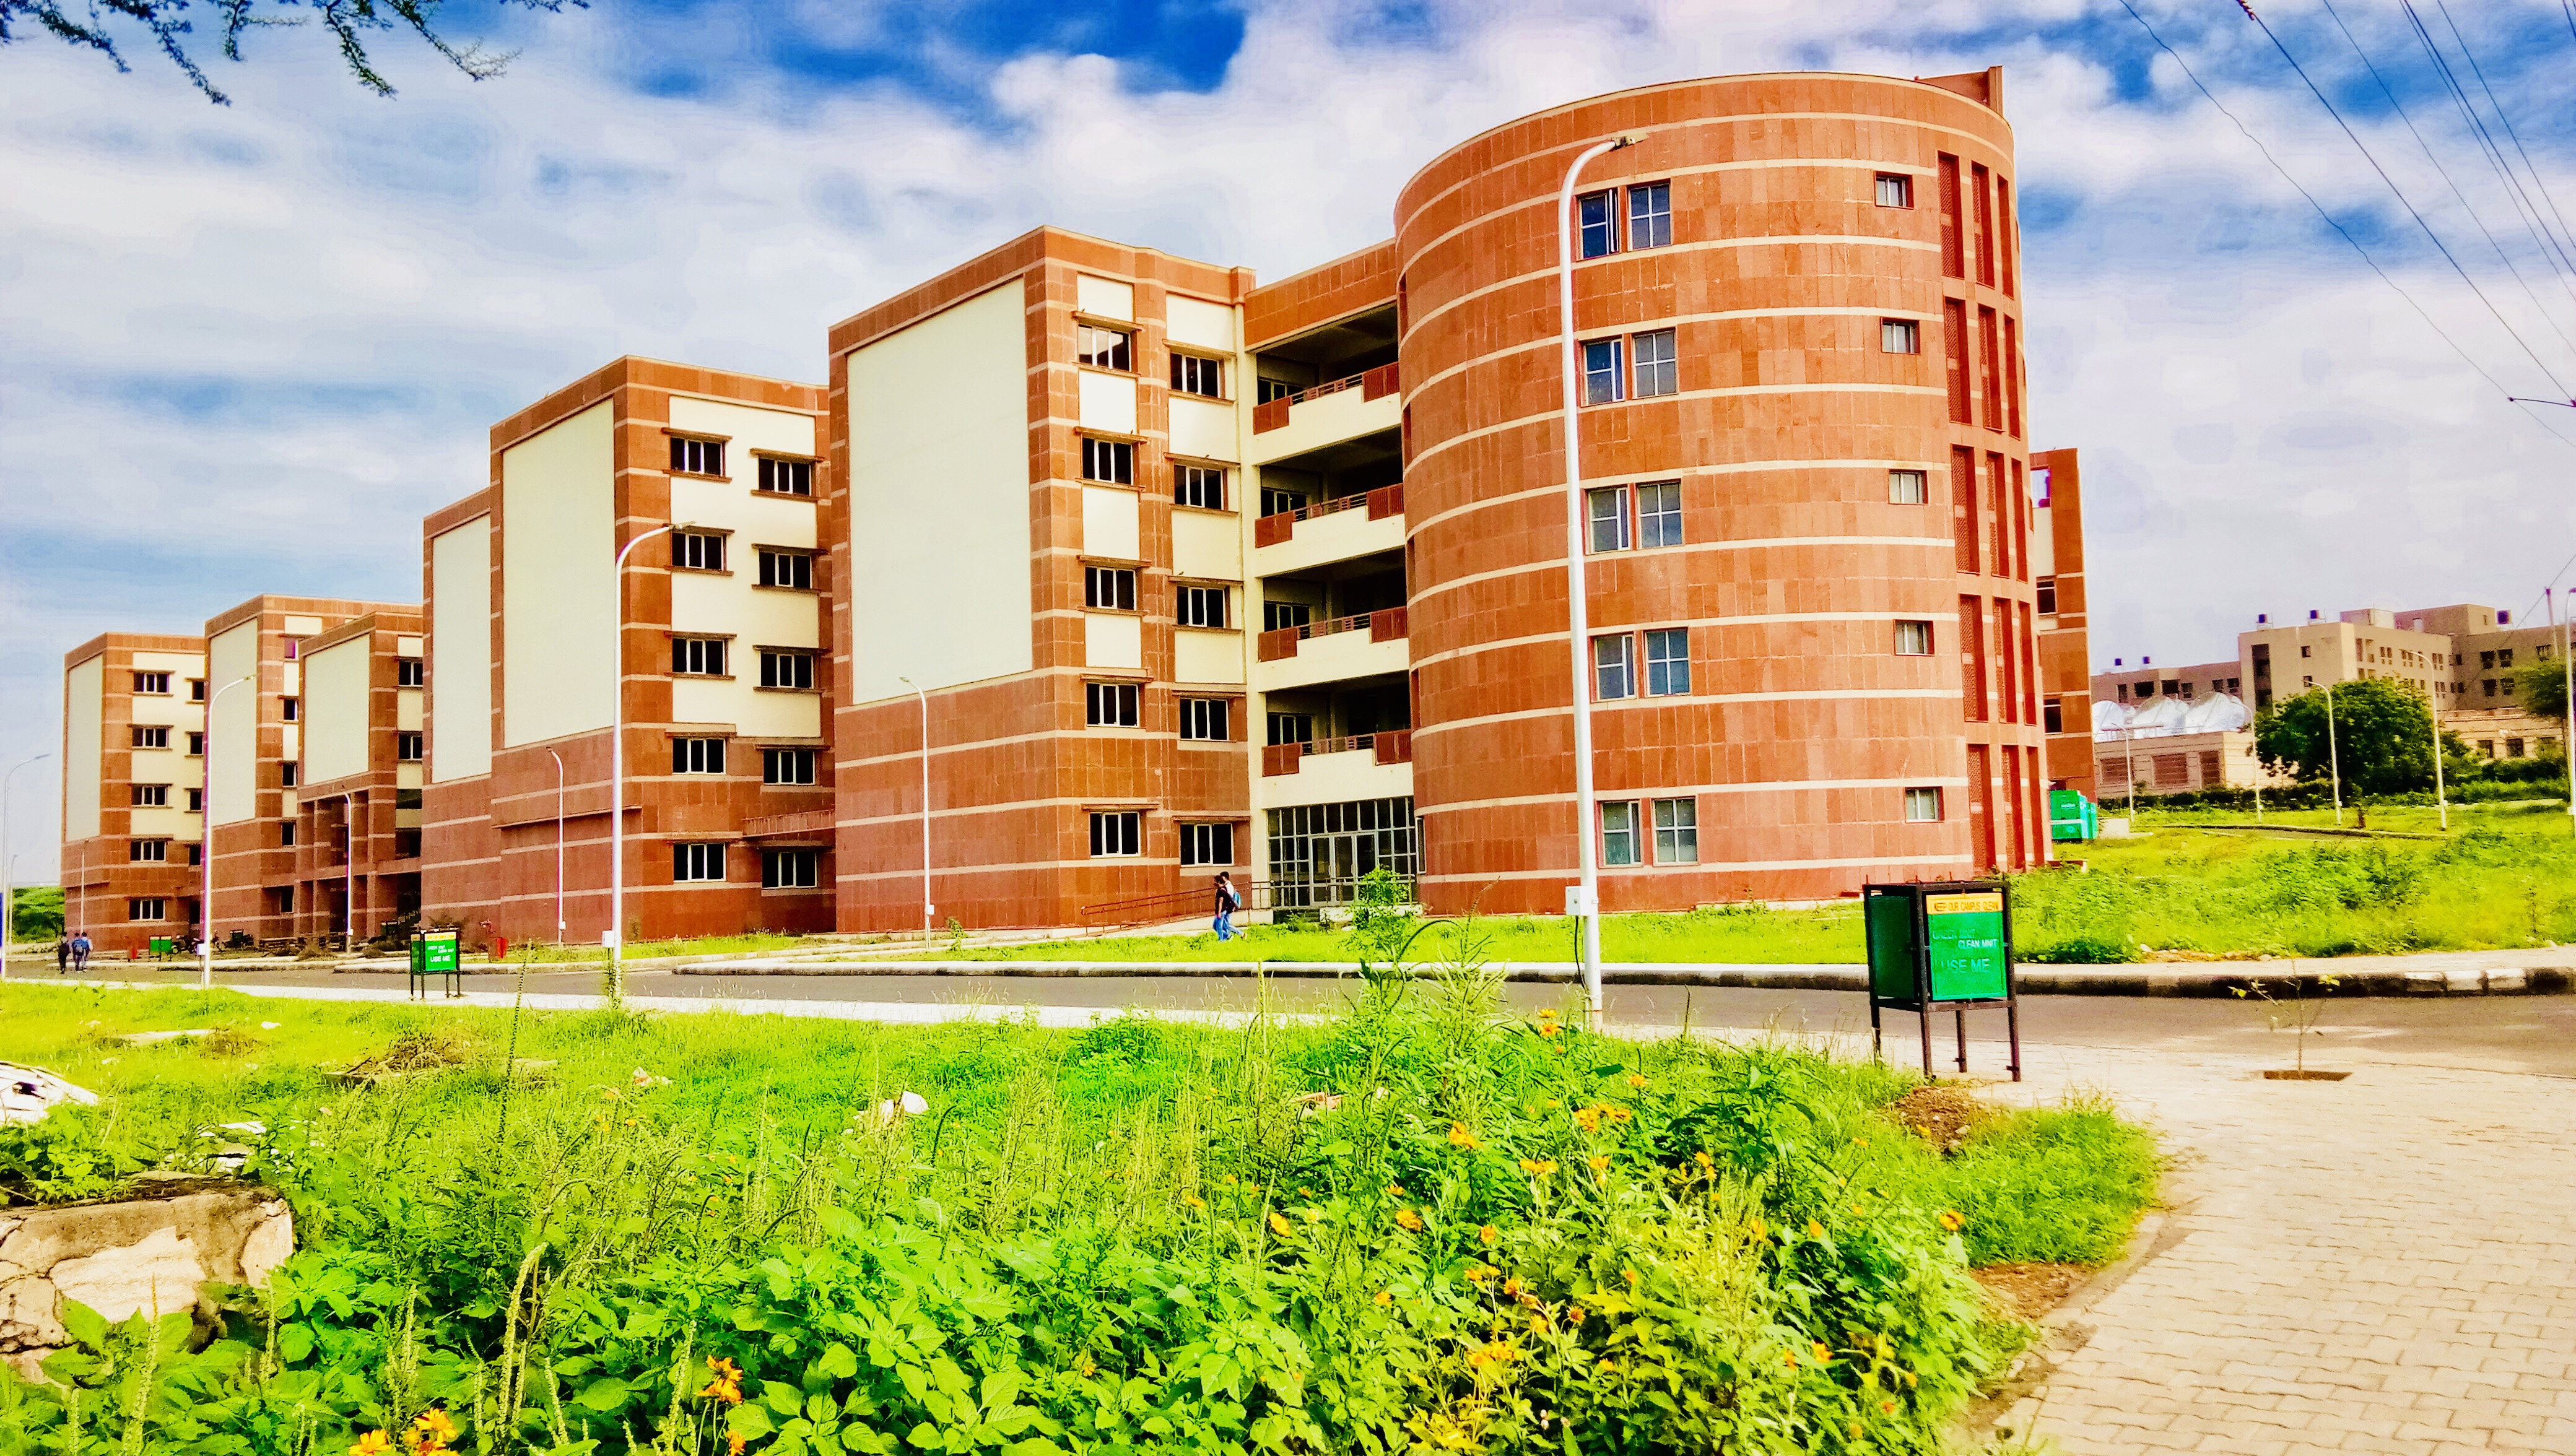 IIIT (Indian Institute of Information Technology), Kota Image